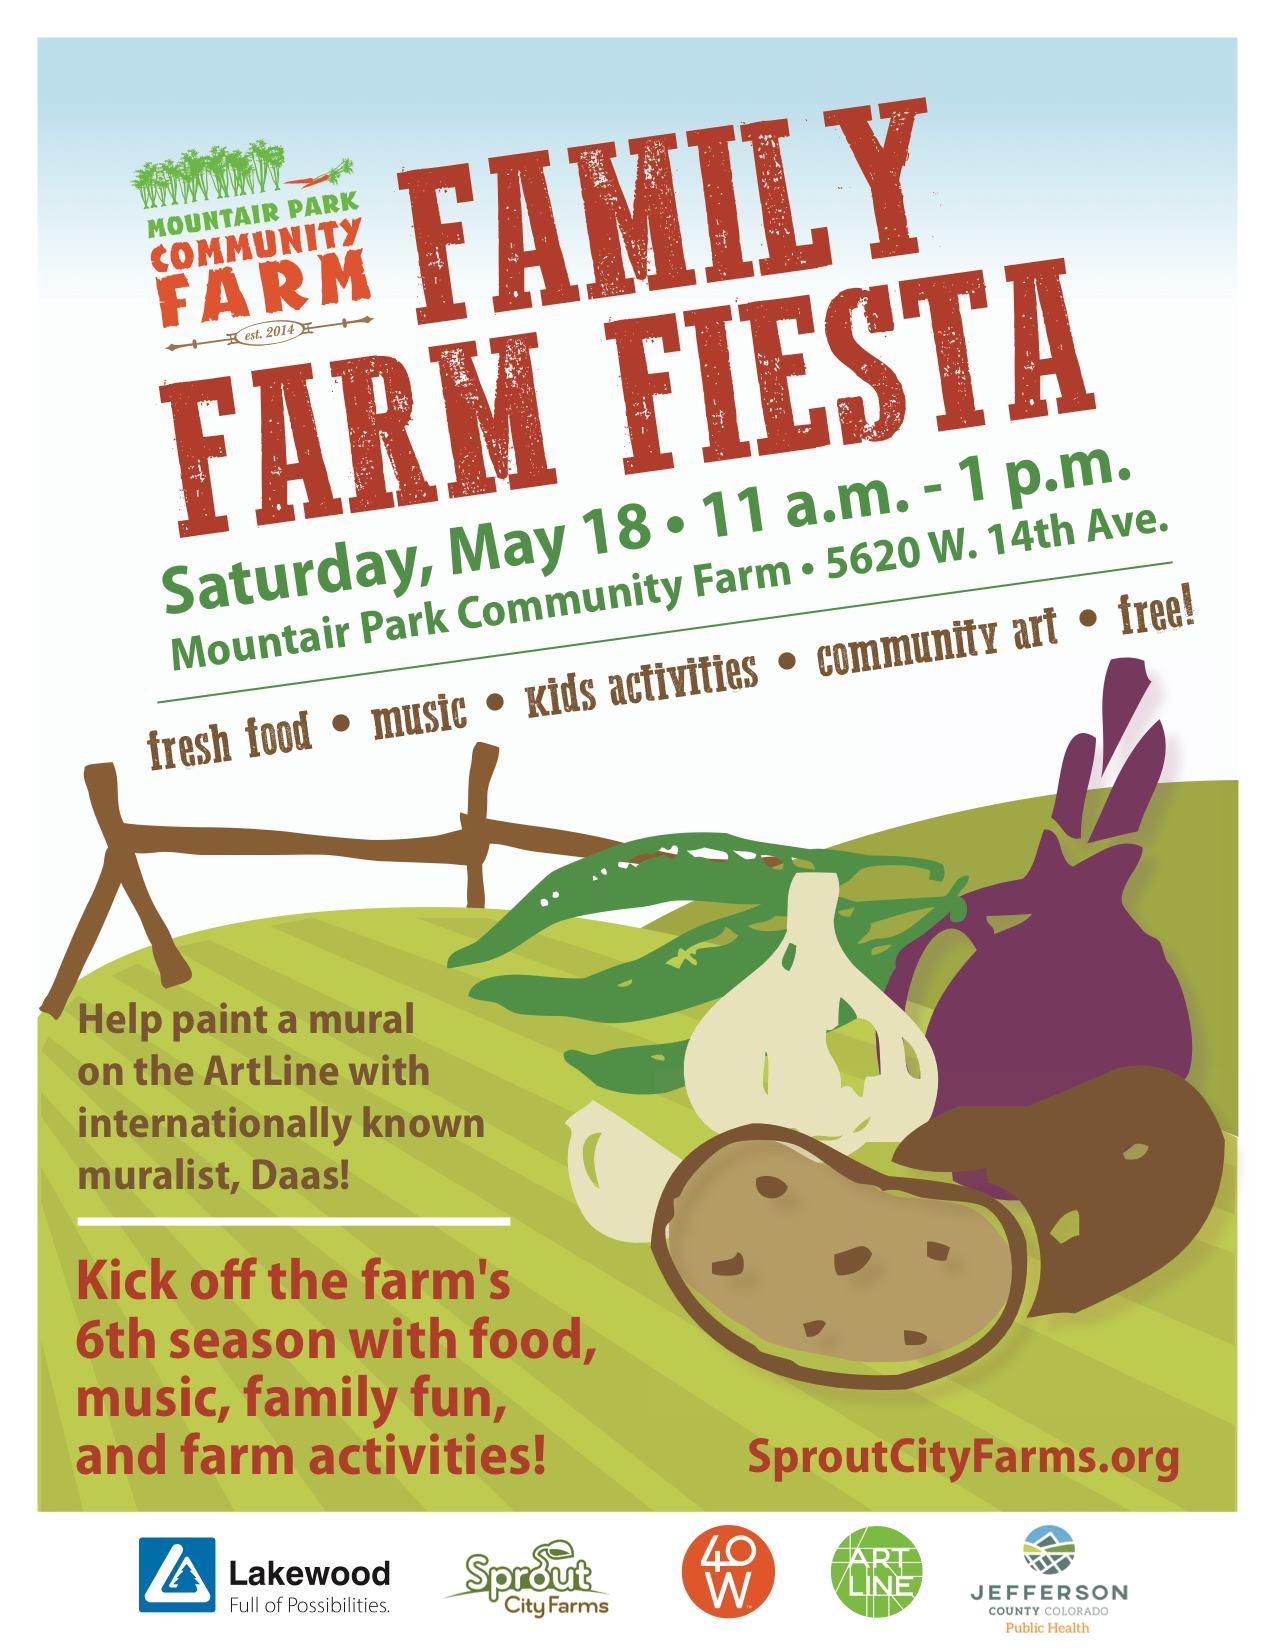 farm fiesta 40W.jpg